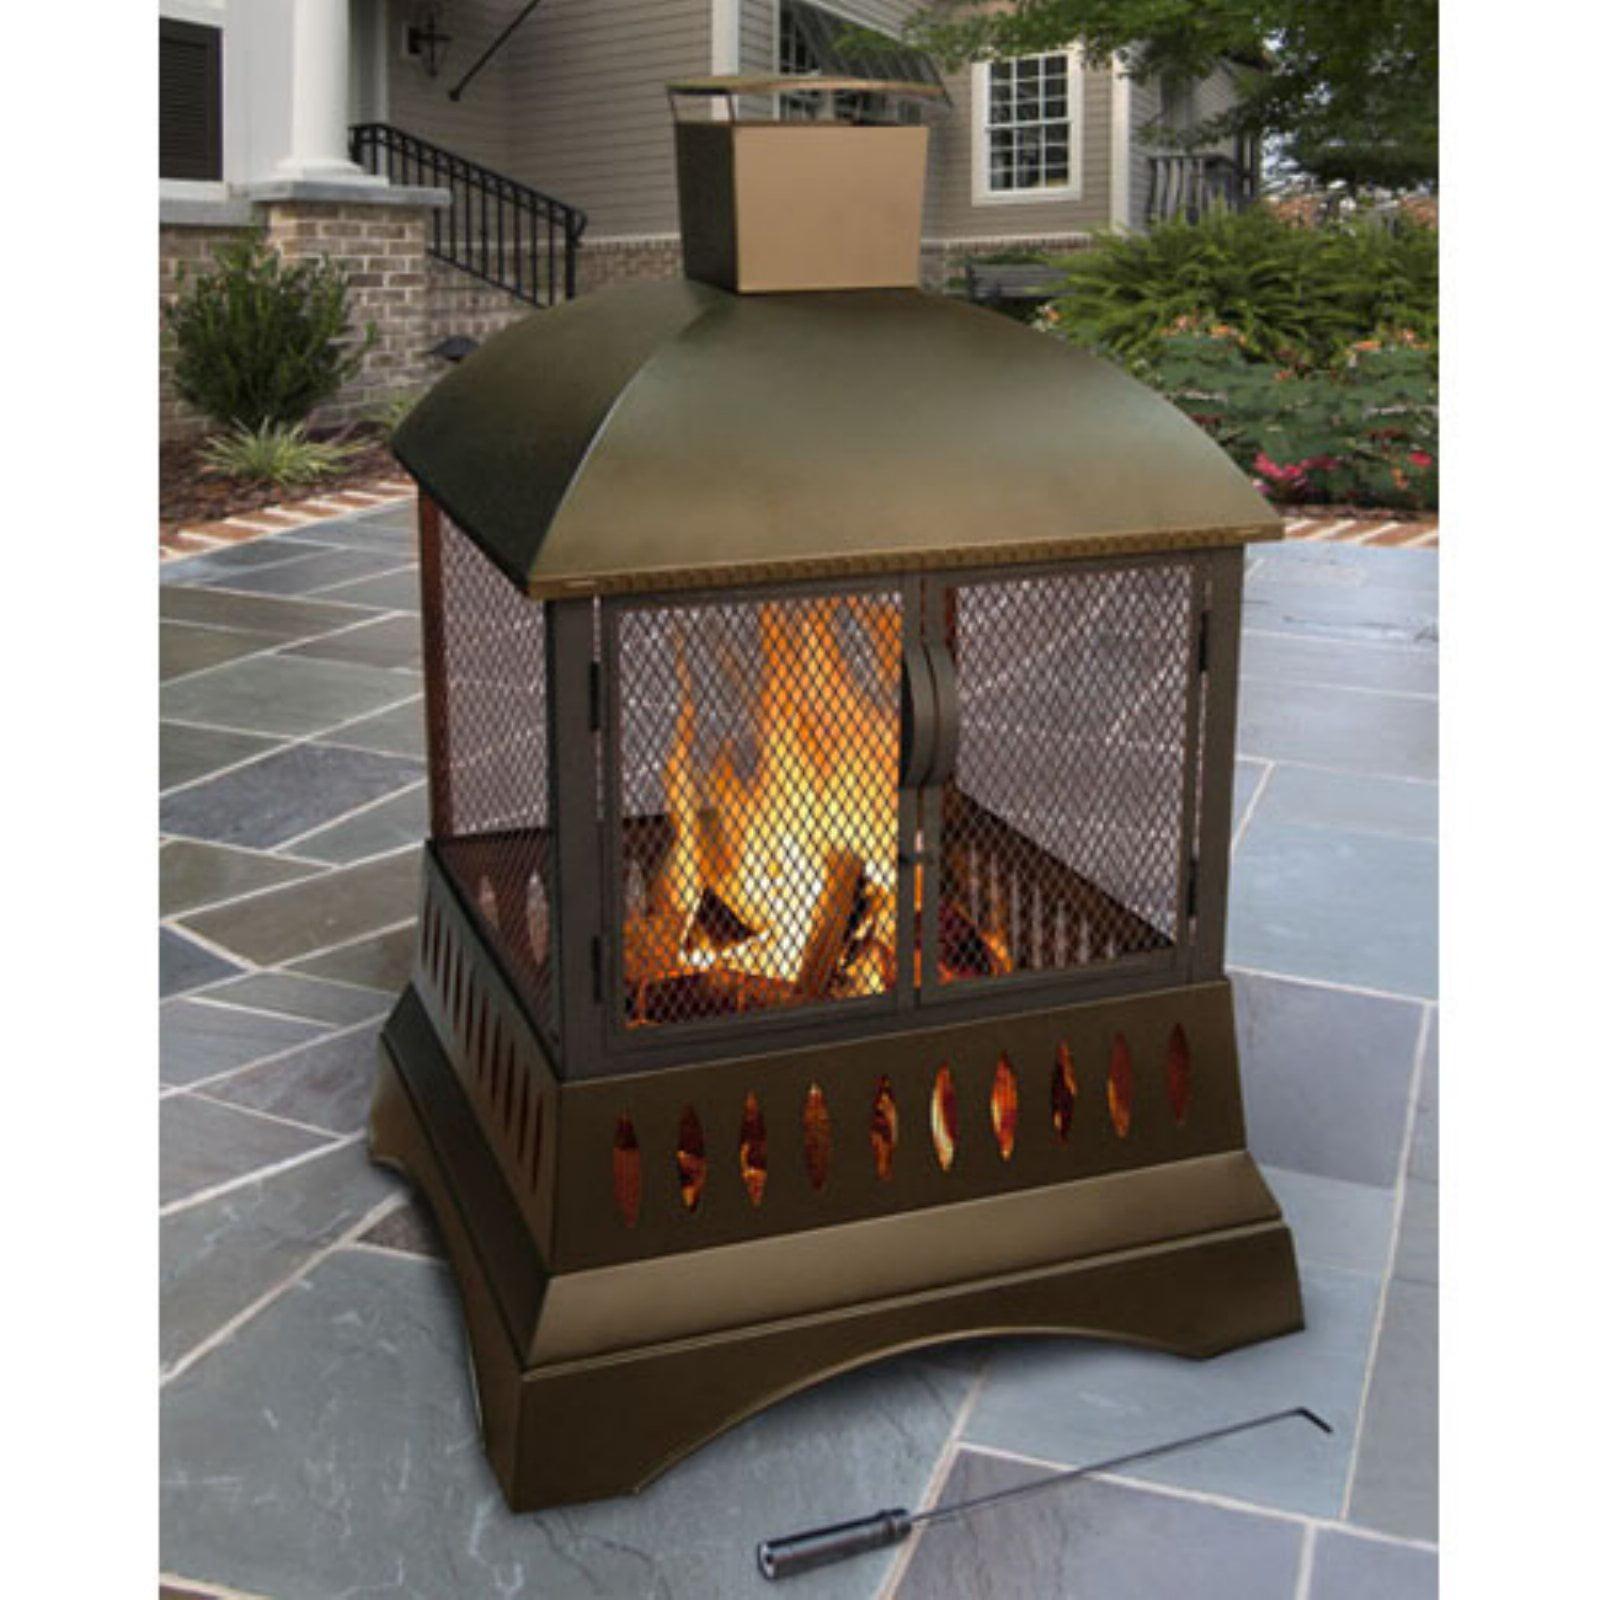 Landmann Grandezza Wood Burning Outdoor Fireplace by Landmann USA